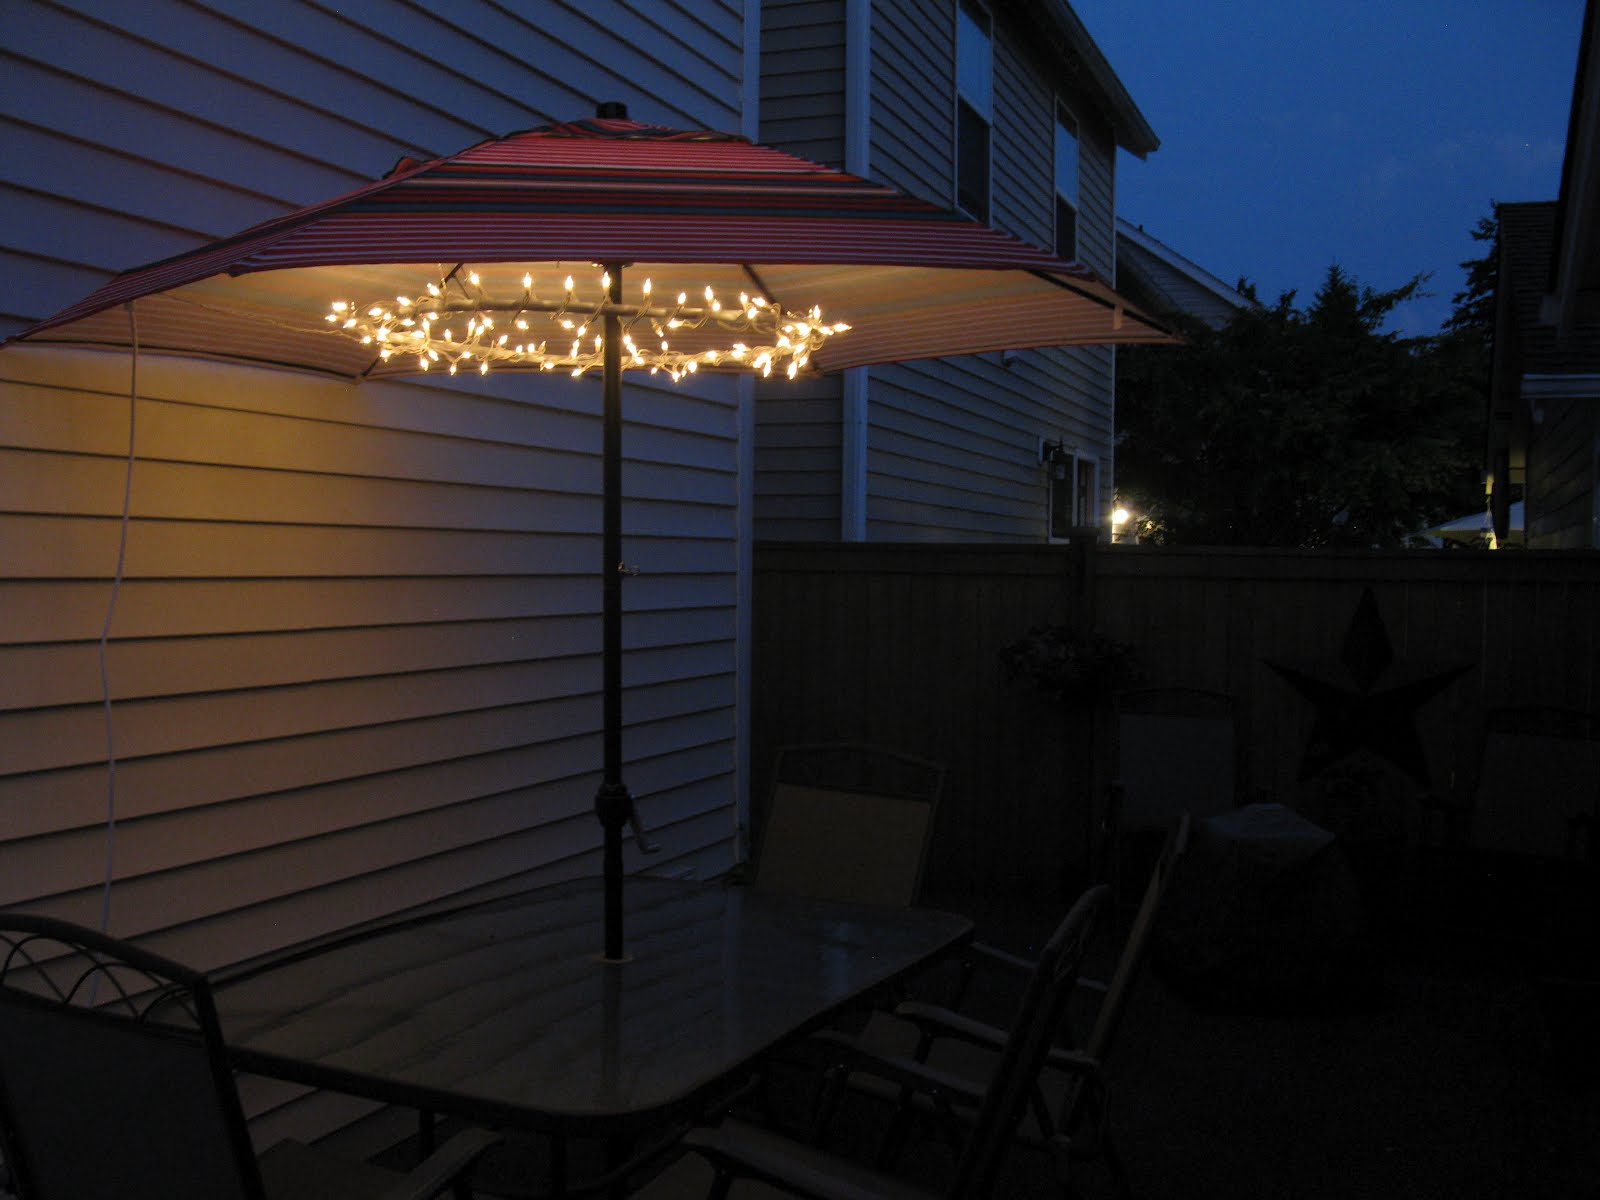 Lighted Patio Umbrella Providing An Amusing Nuance Homesfeed